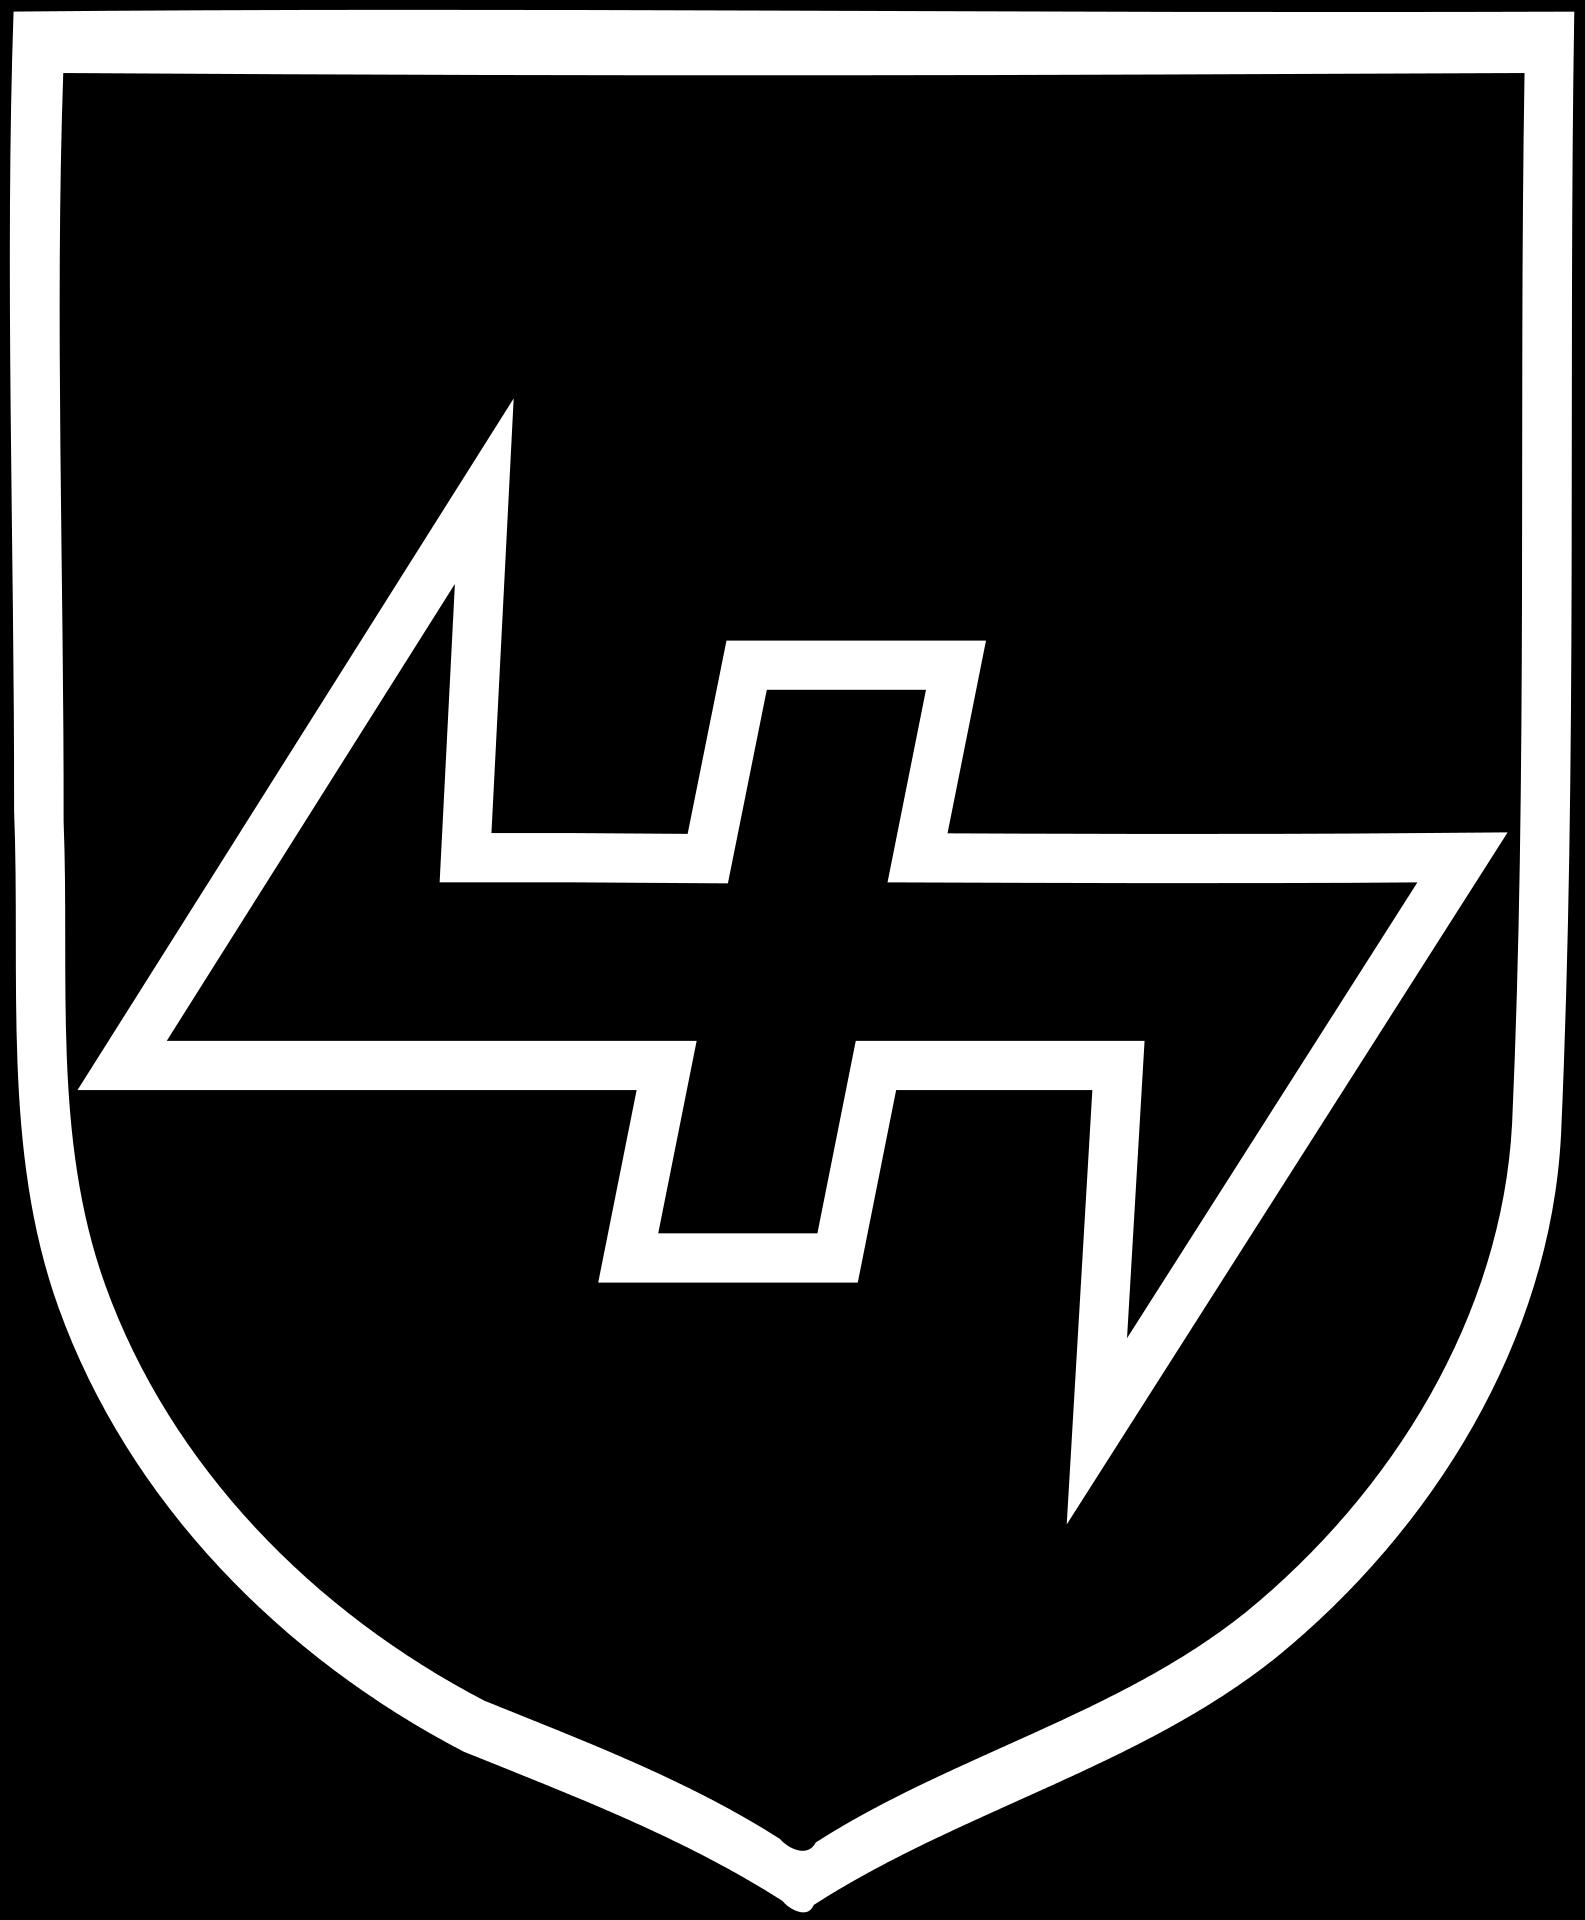 34 ss freiwilligen grenadier division landstorm nederland division buycottarizona